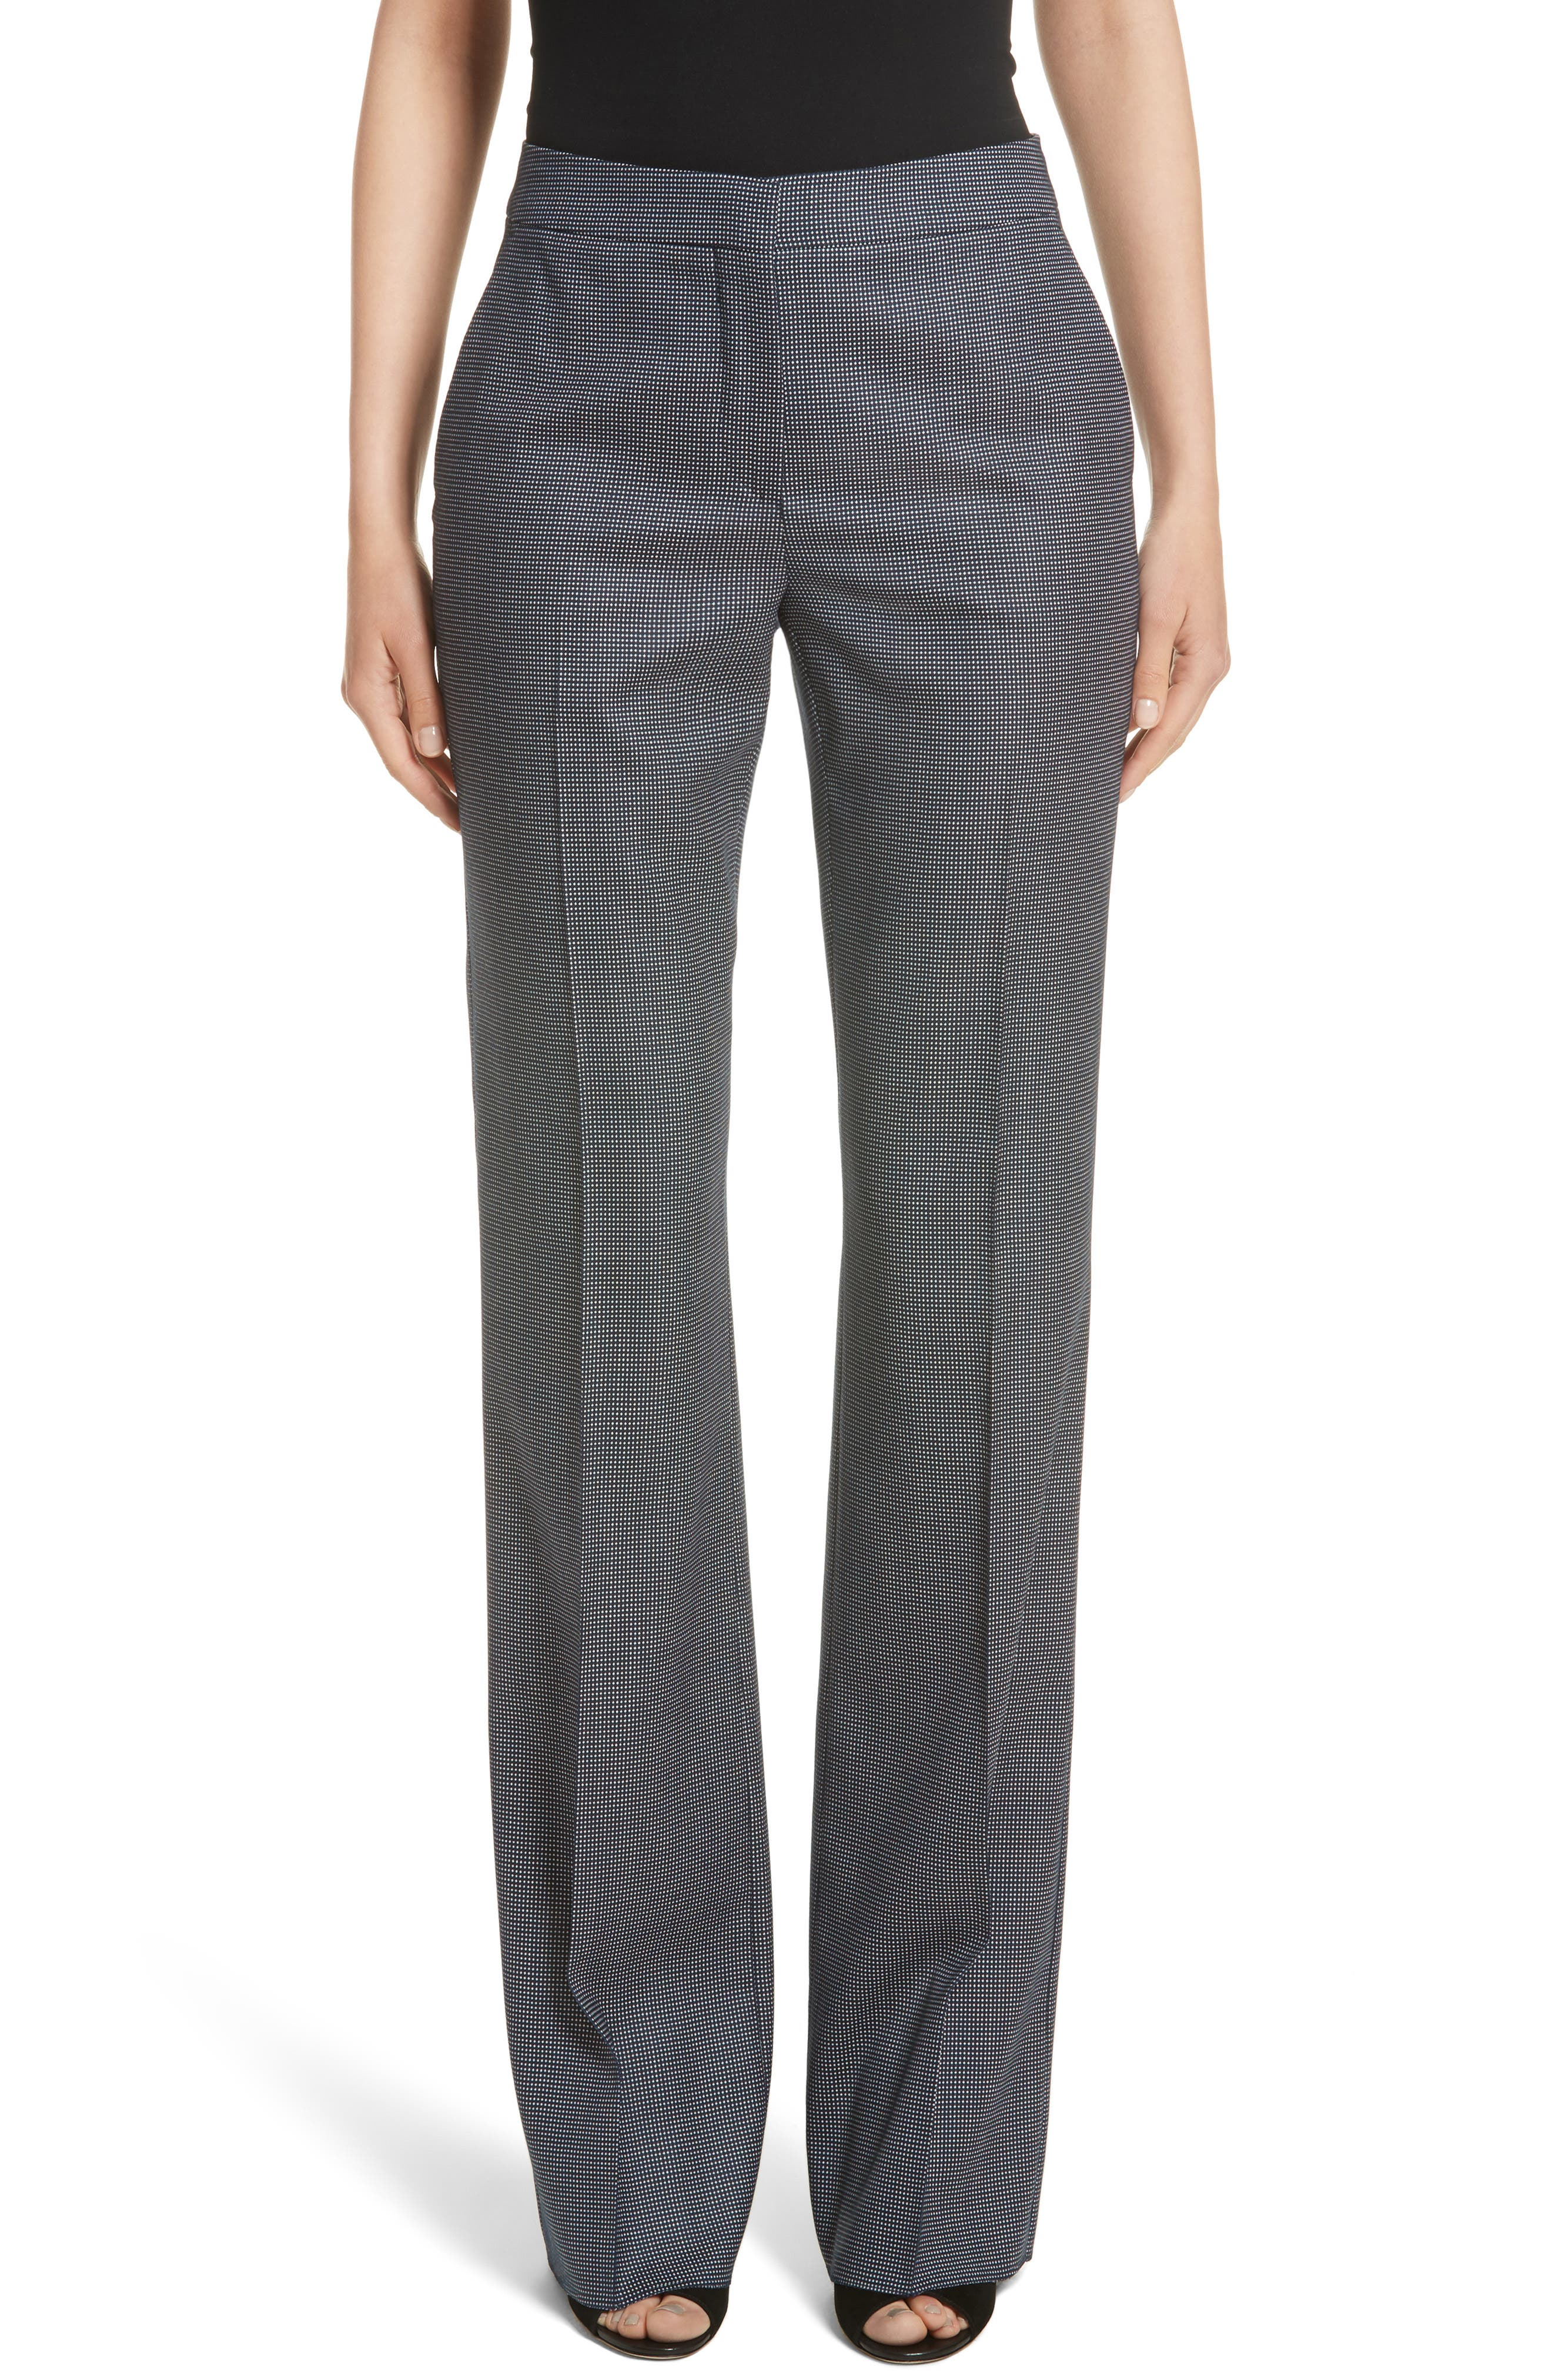 Max Mara Alessia Stretch Wool & Silk Pants (Nordstrom Exclusive)